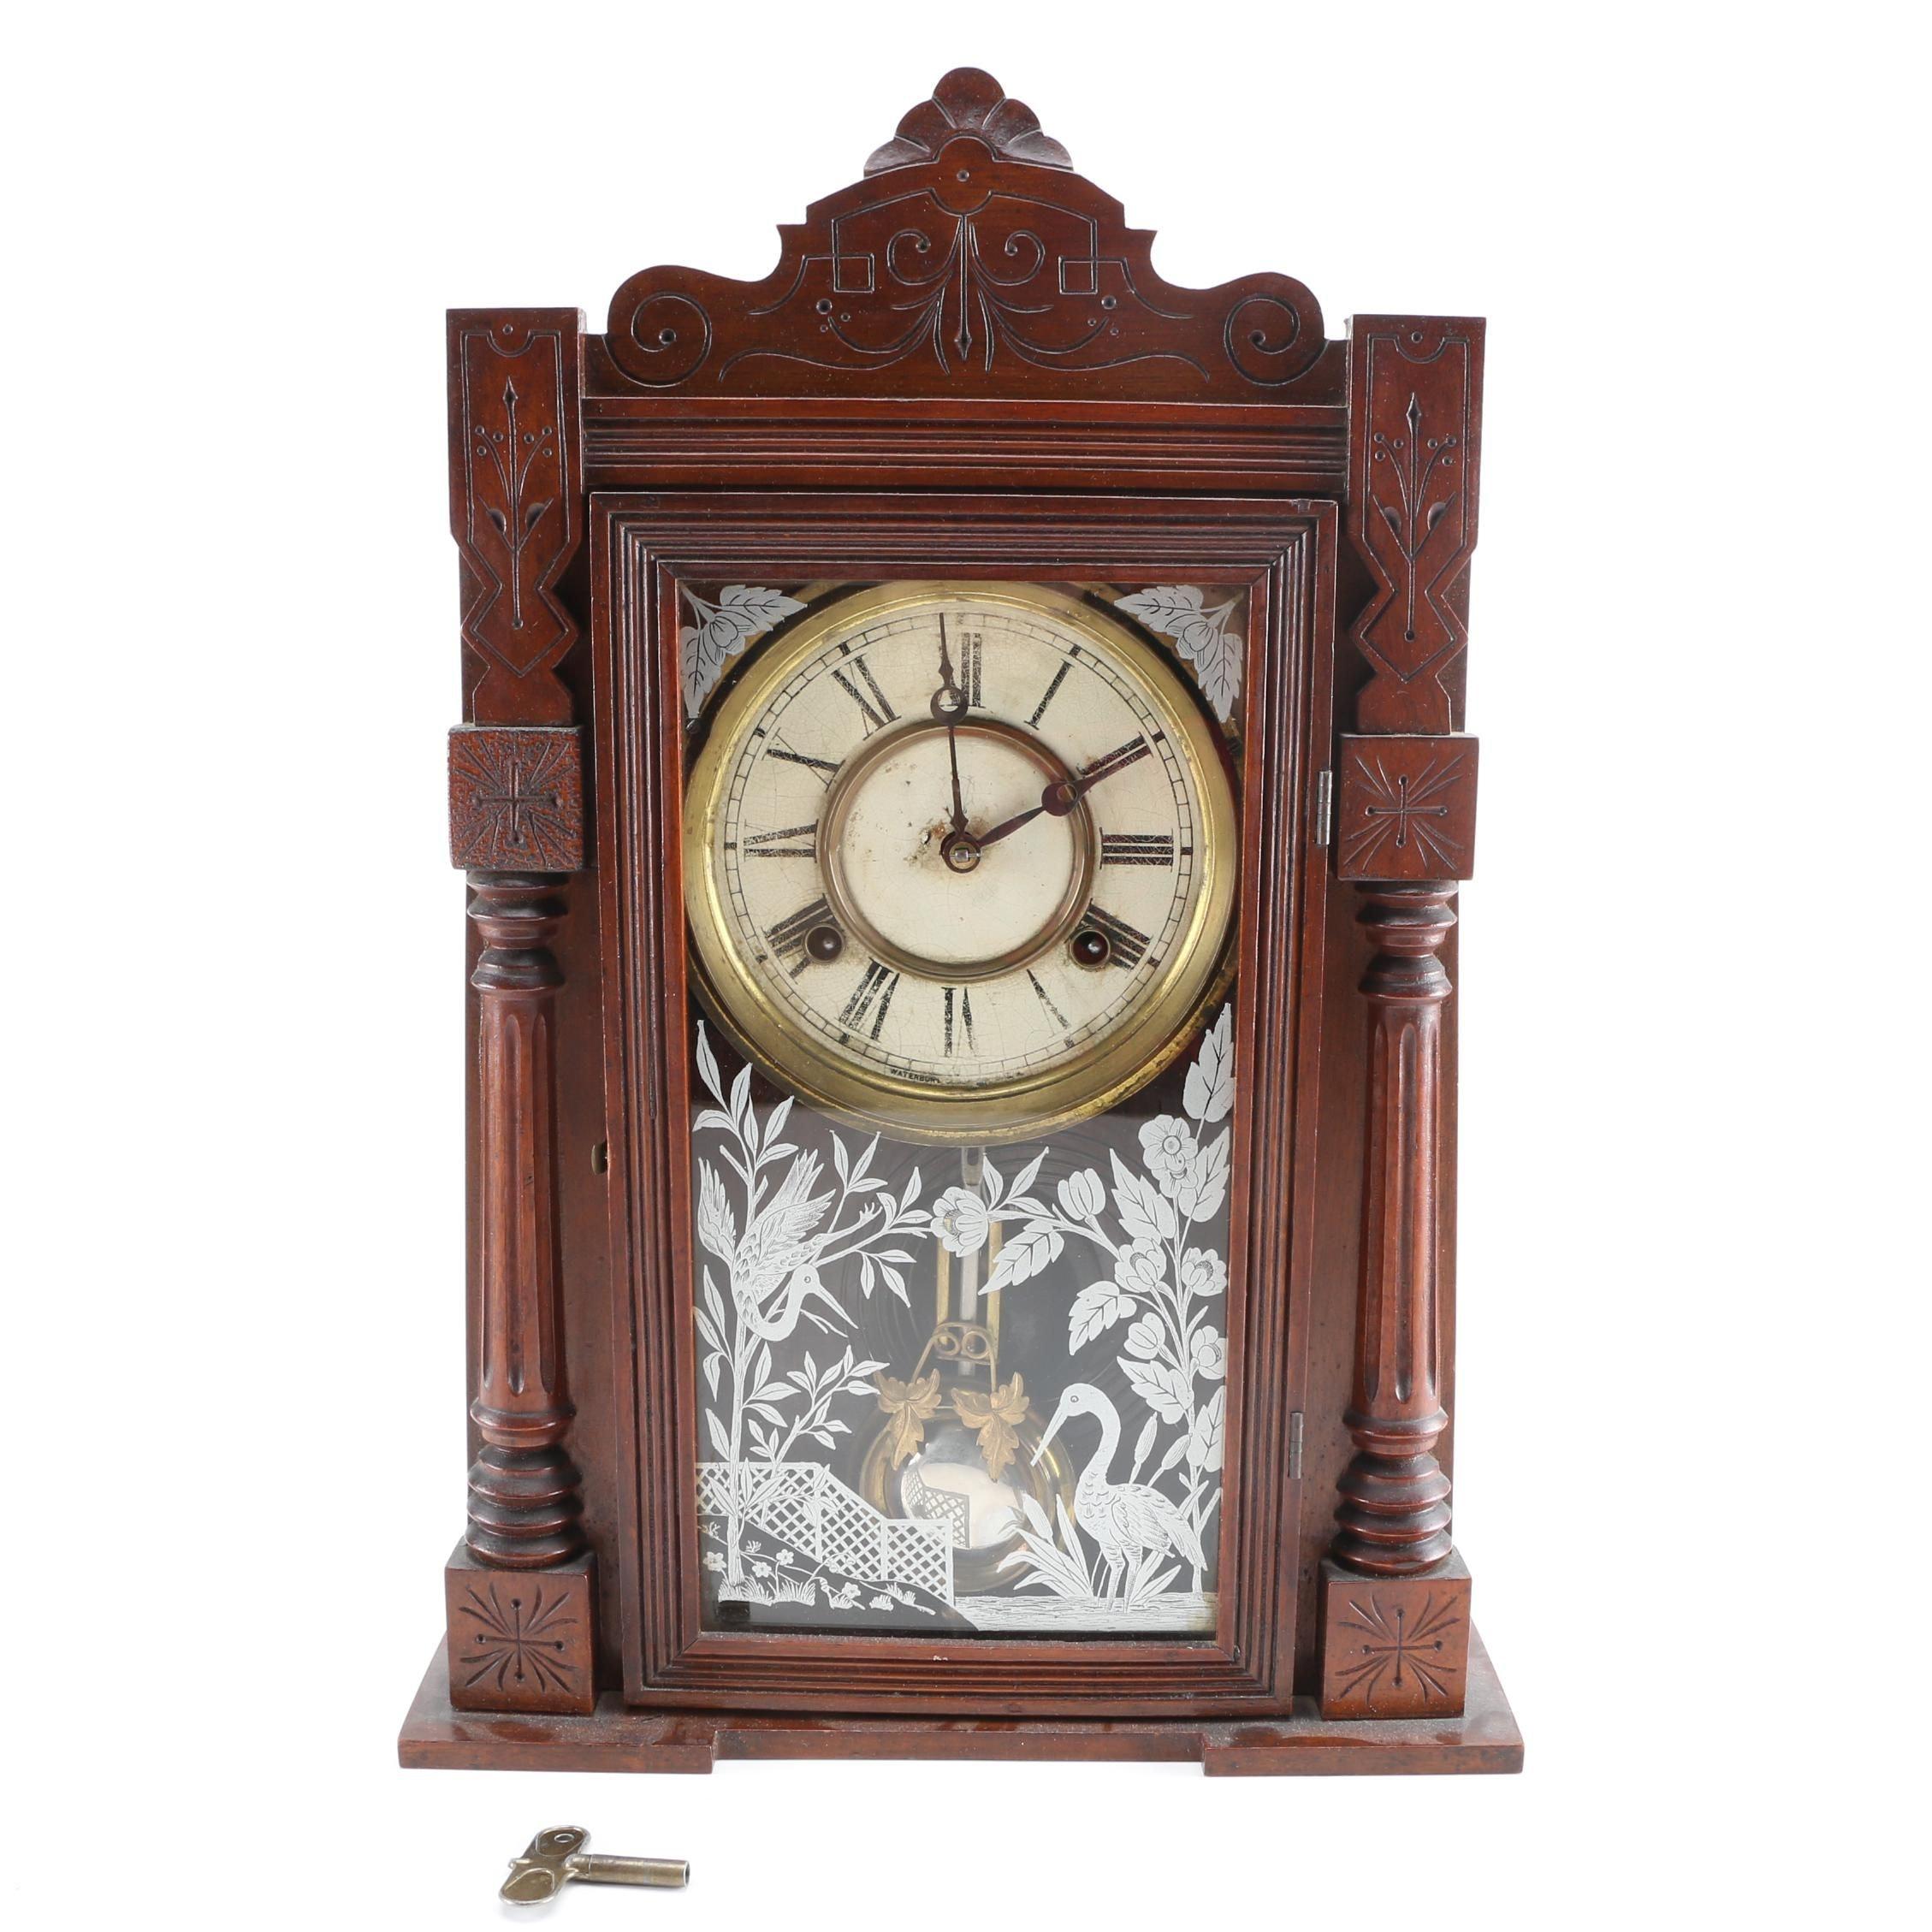 Antique Wm L. Gilbert Clock Co. Mantel Clock